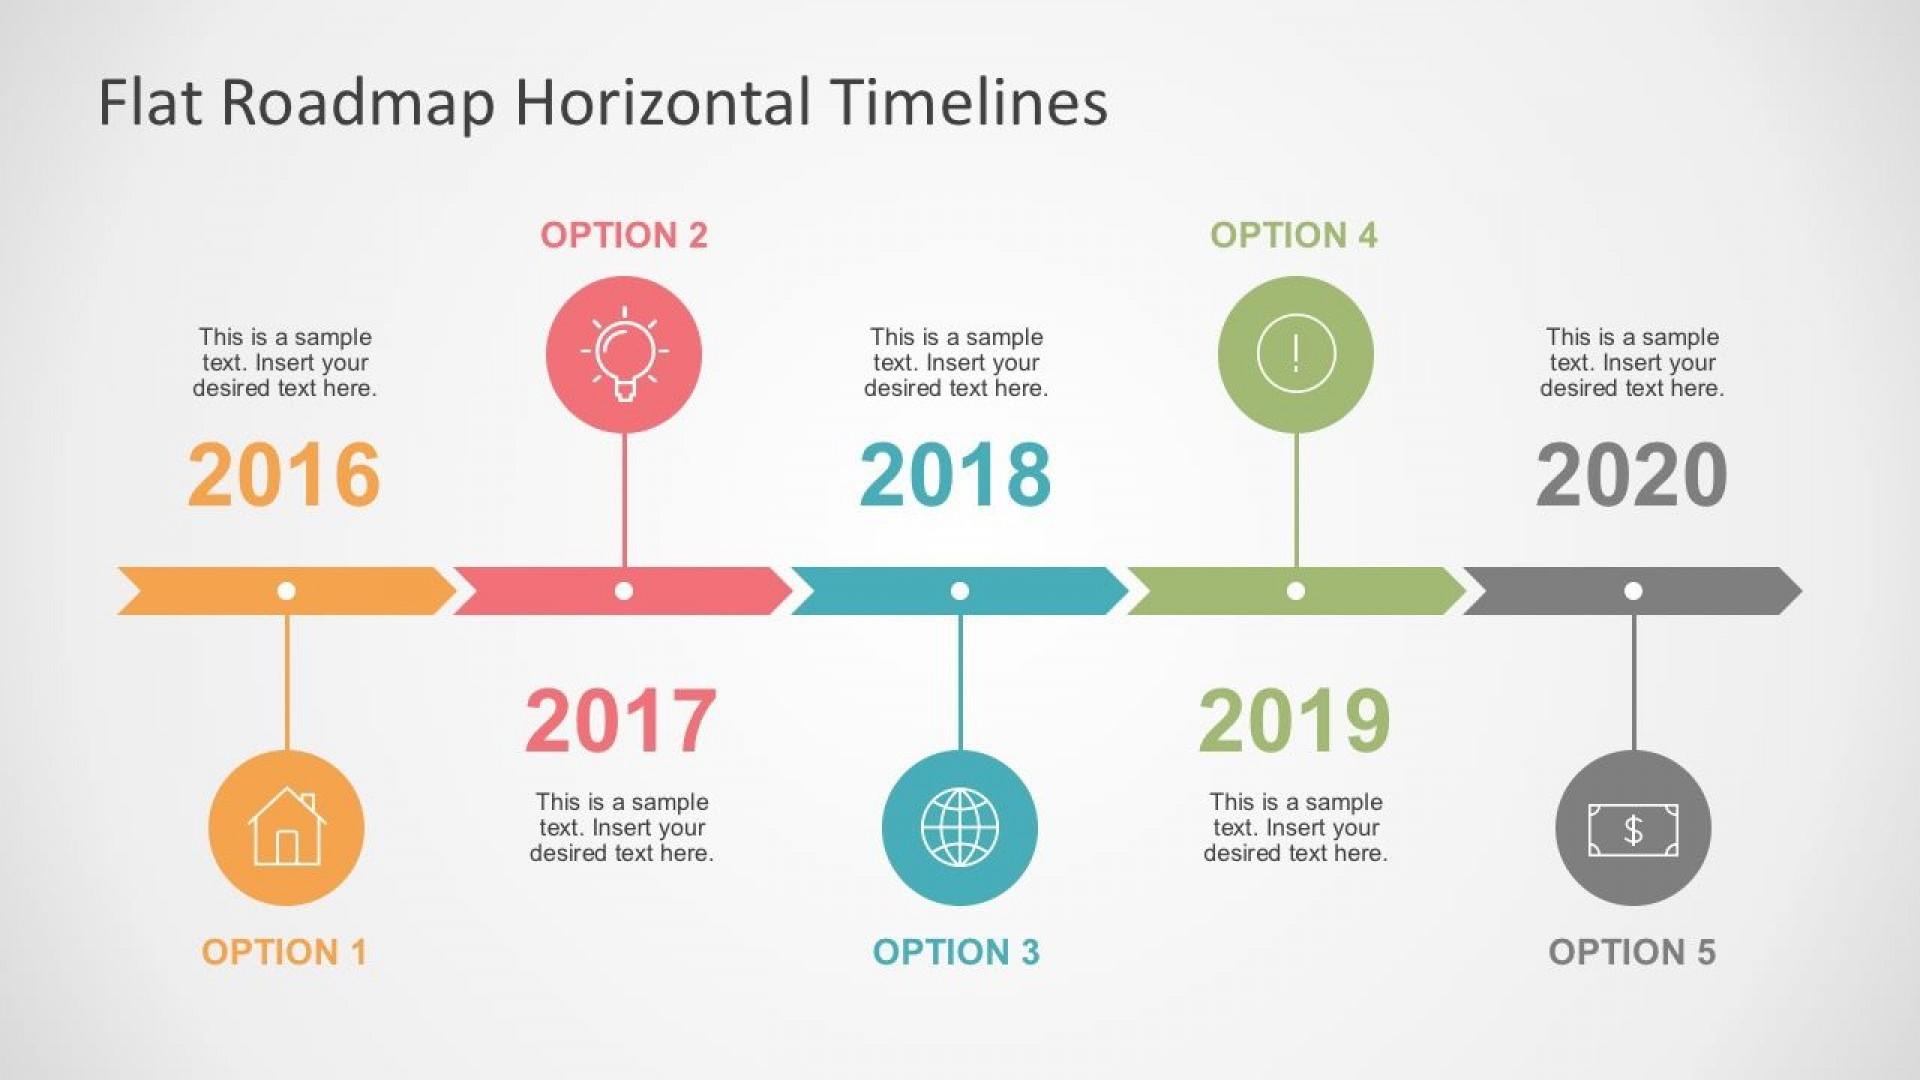 006 Unbelievable Timeline Template For Powerpoint Idea  Presentation Project Management Mac1920